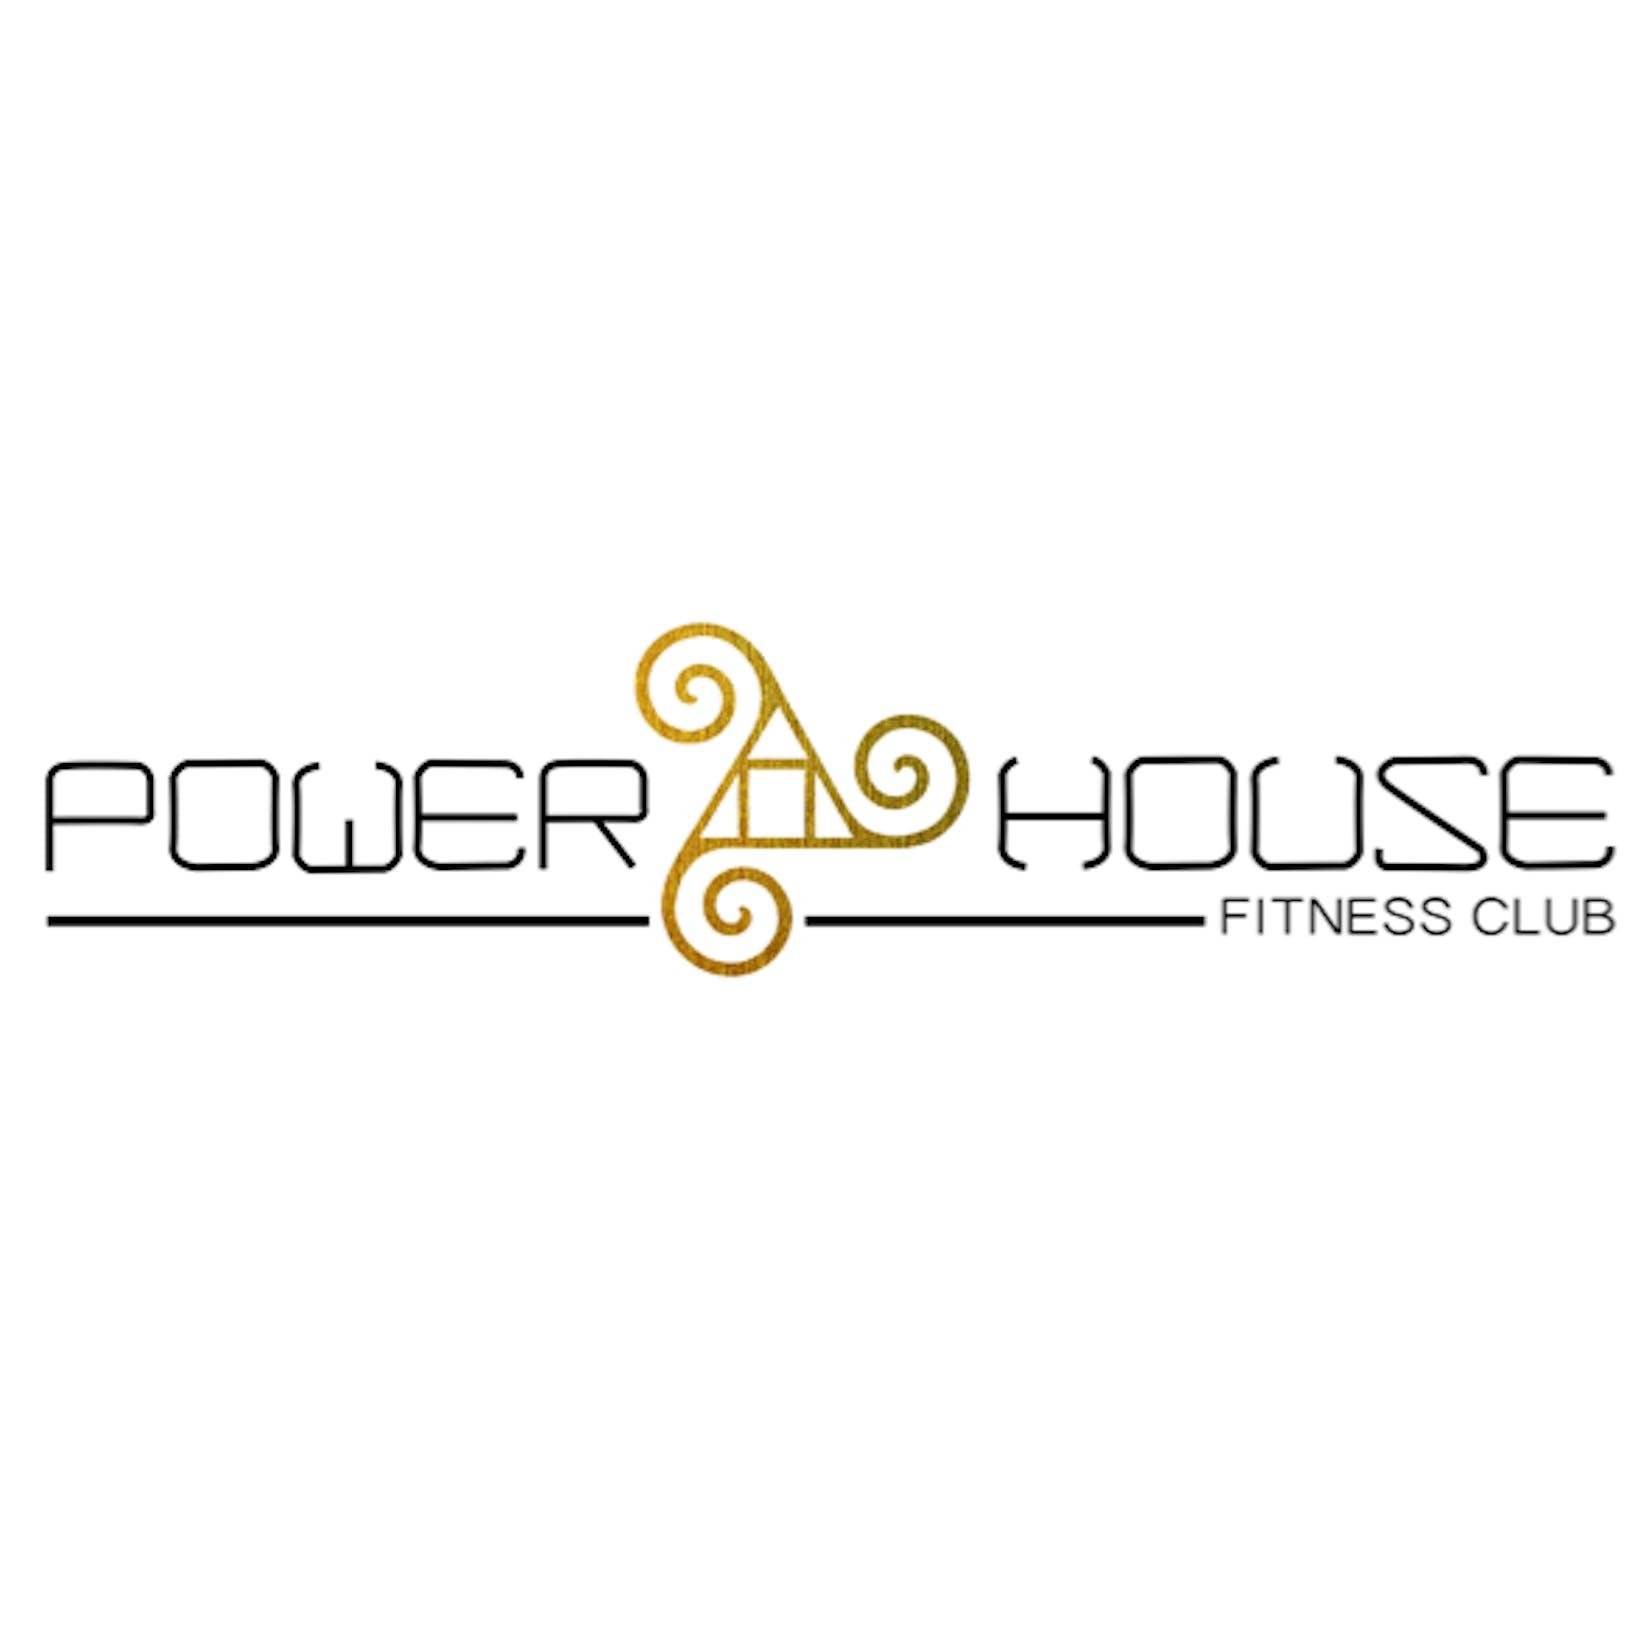 POWER HOUSE FITNESS CLUB | Beauty